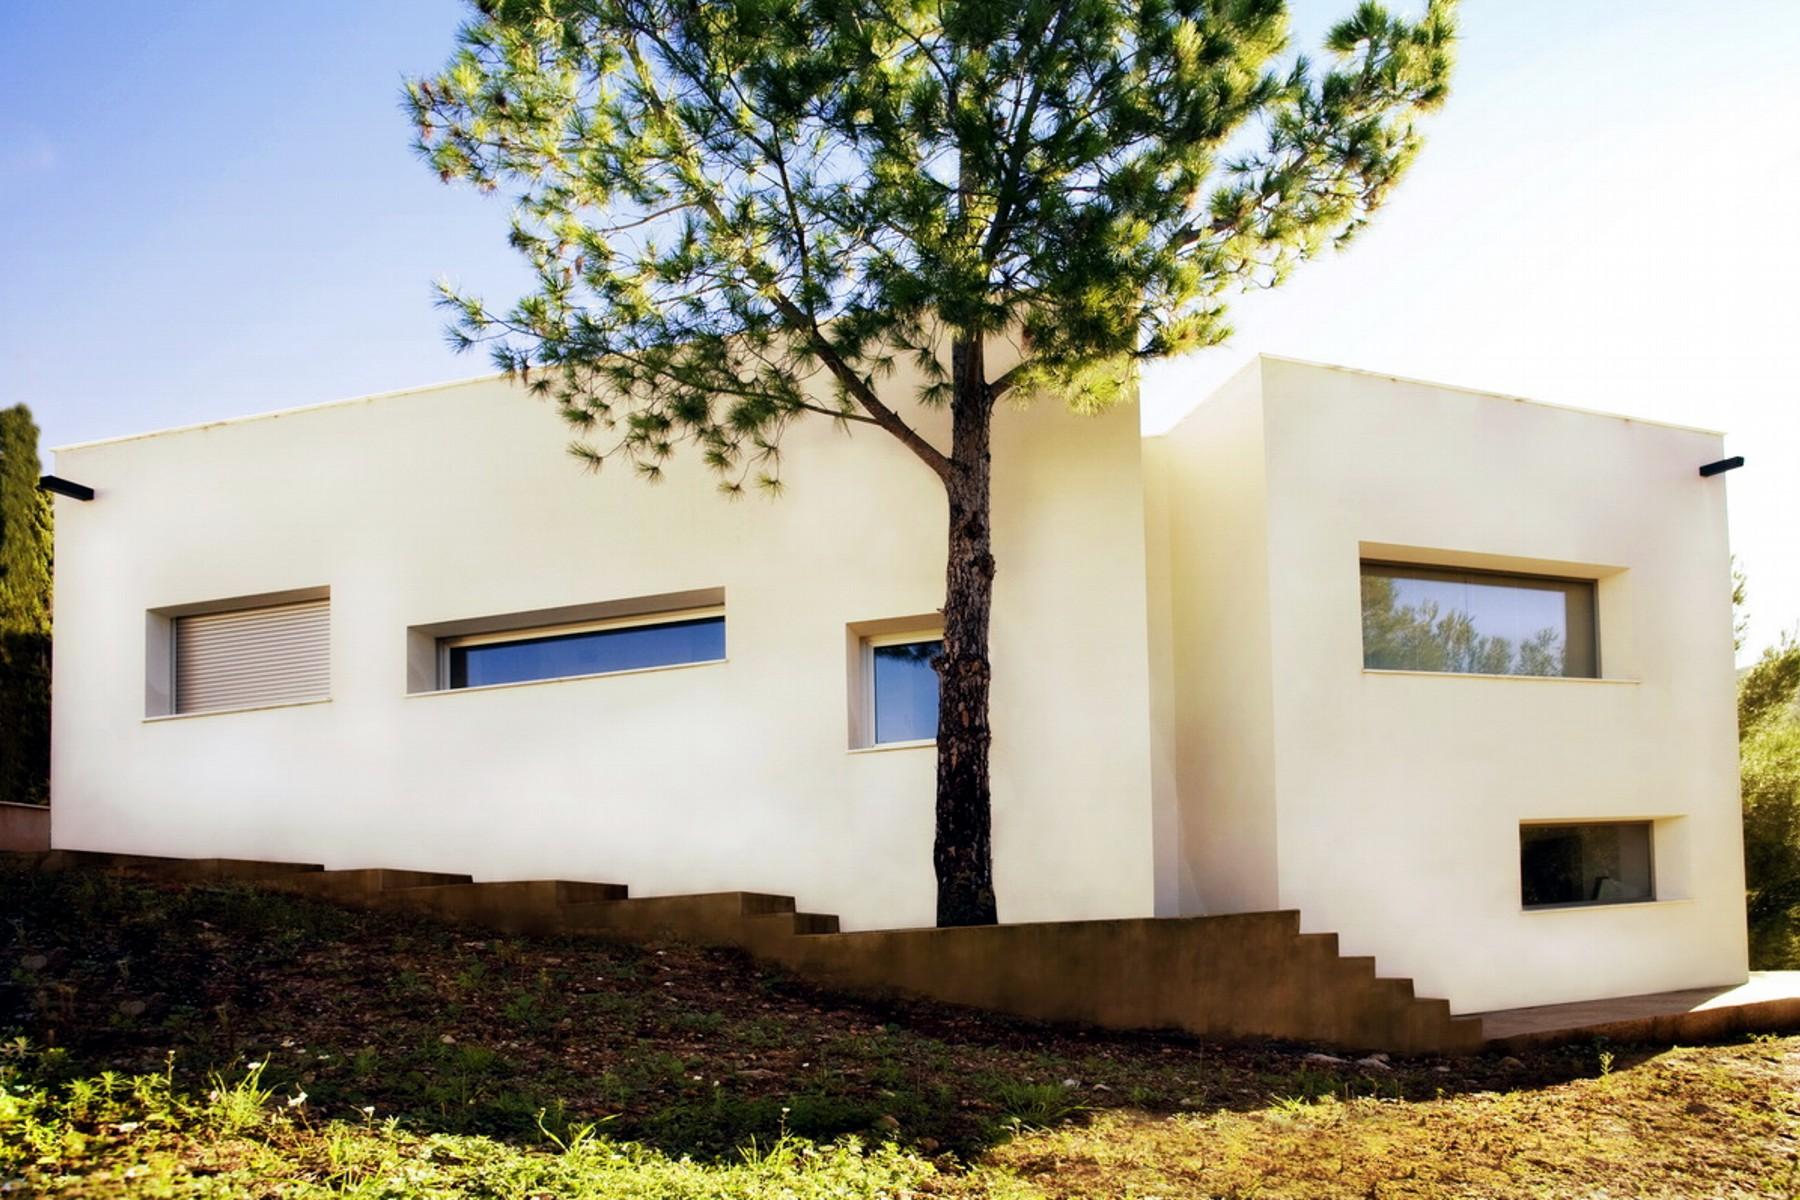 Imaginarq-087-Vivienda-unifamiliar-Orbeta-Alicante-04a